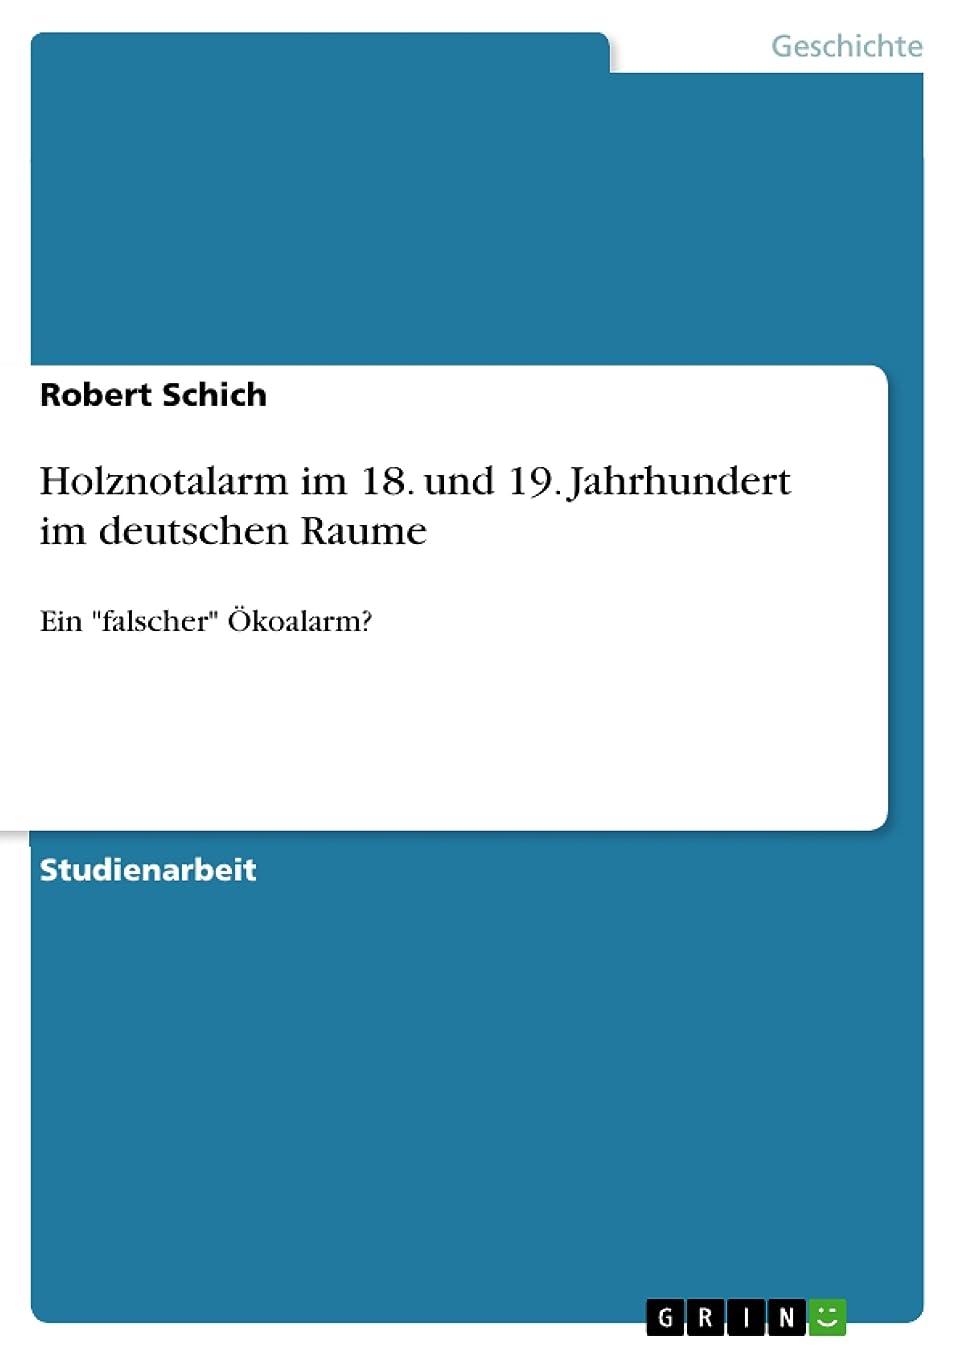 トレーニング周術期感情Holznotalarm im 18. und 19. Jahrhundert im deutschen Raume: Ein